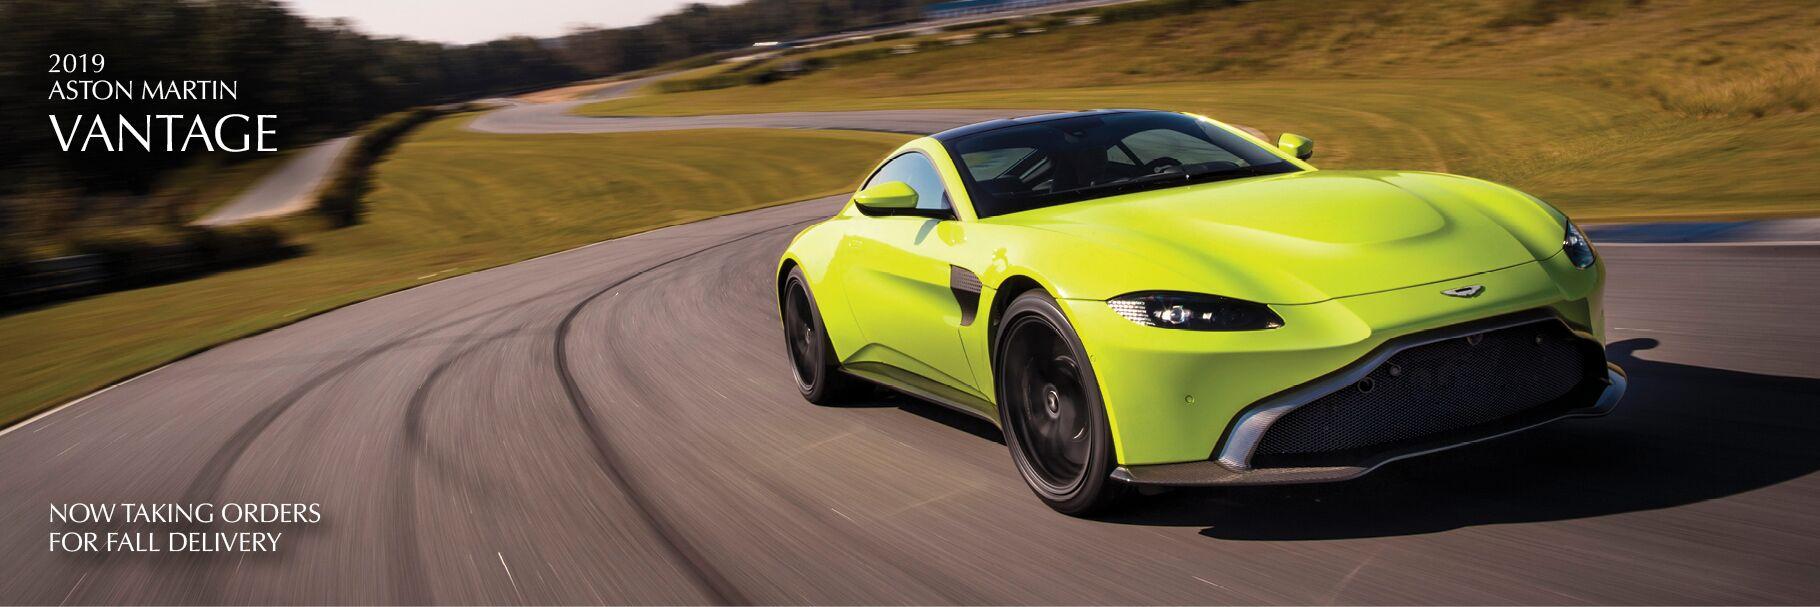 New Aston Martin & Used Car Dealership | Aston Martin Chicago